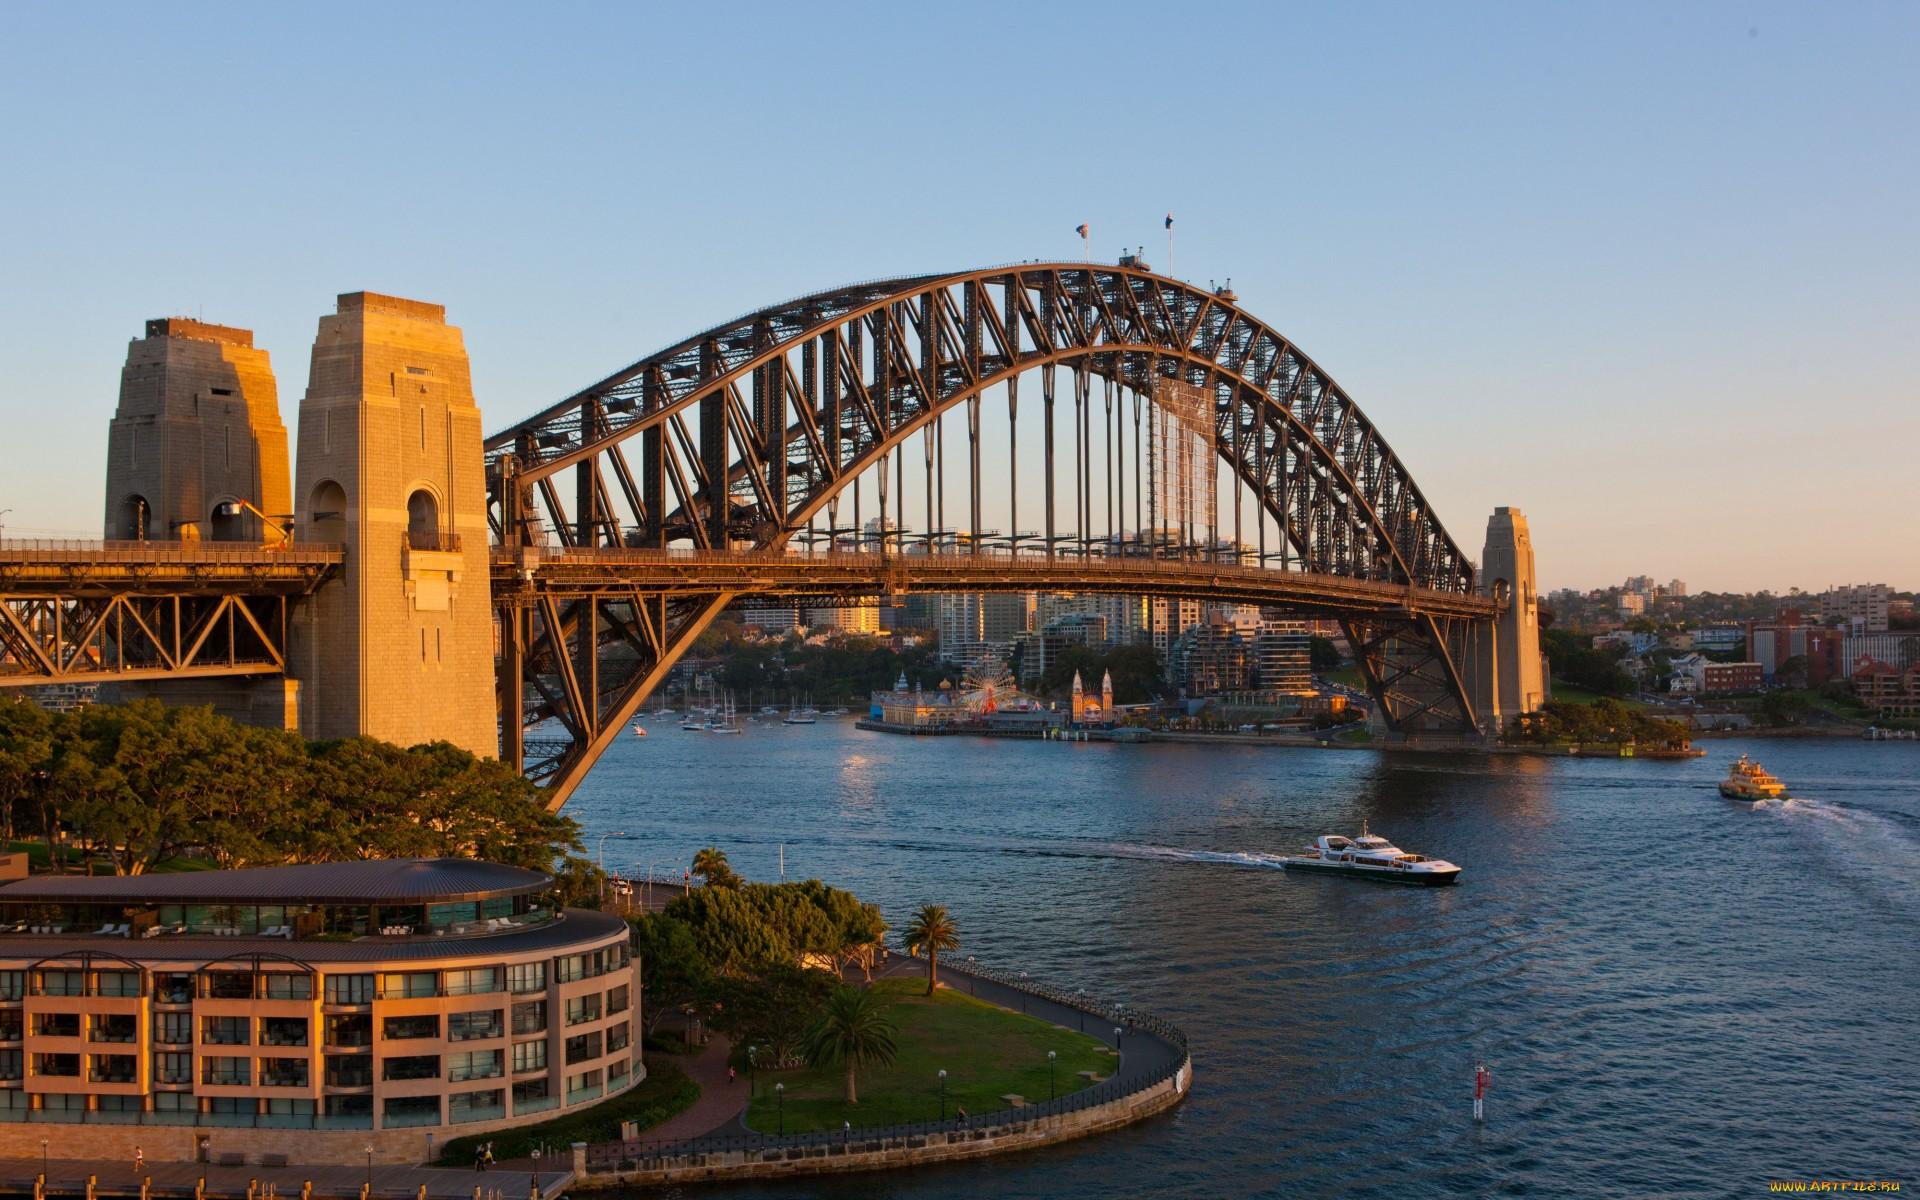 Sydney Harbour Bridge Hd Wallpaper Background Image 1920x1200